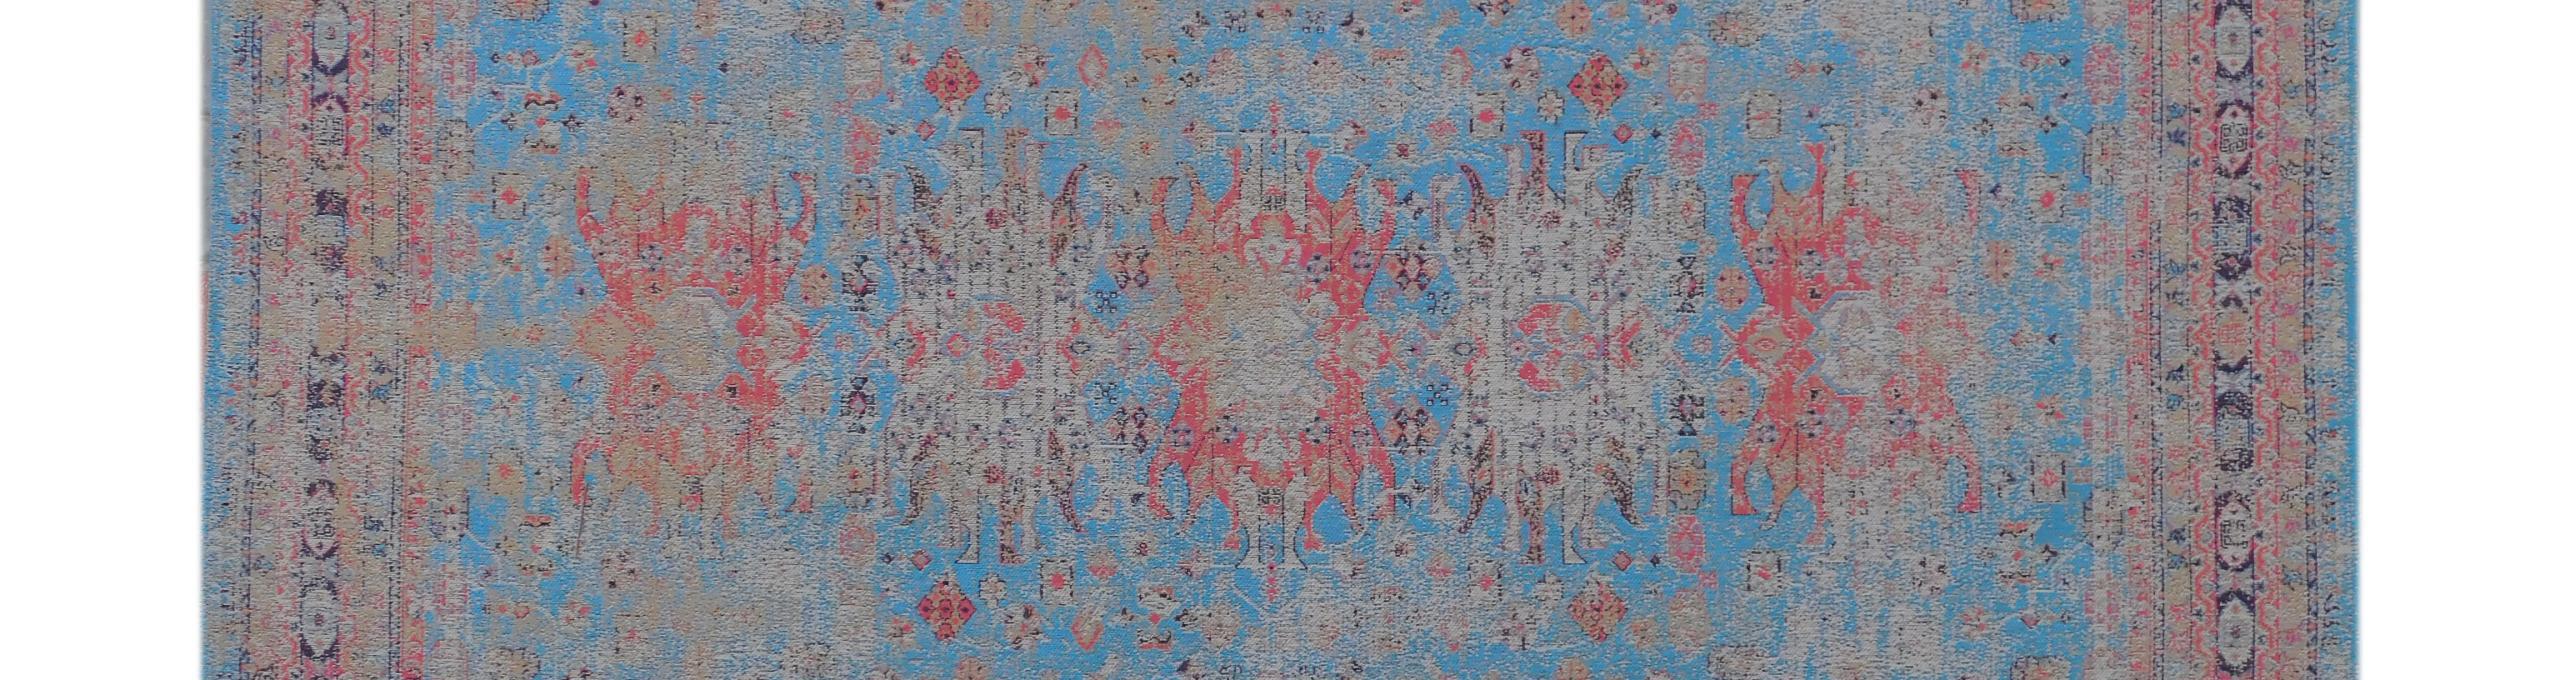 tapijt mooi blauw roze Indistrieel